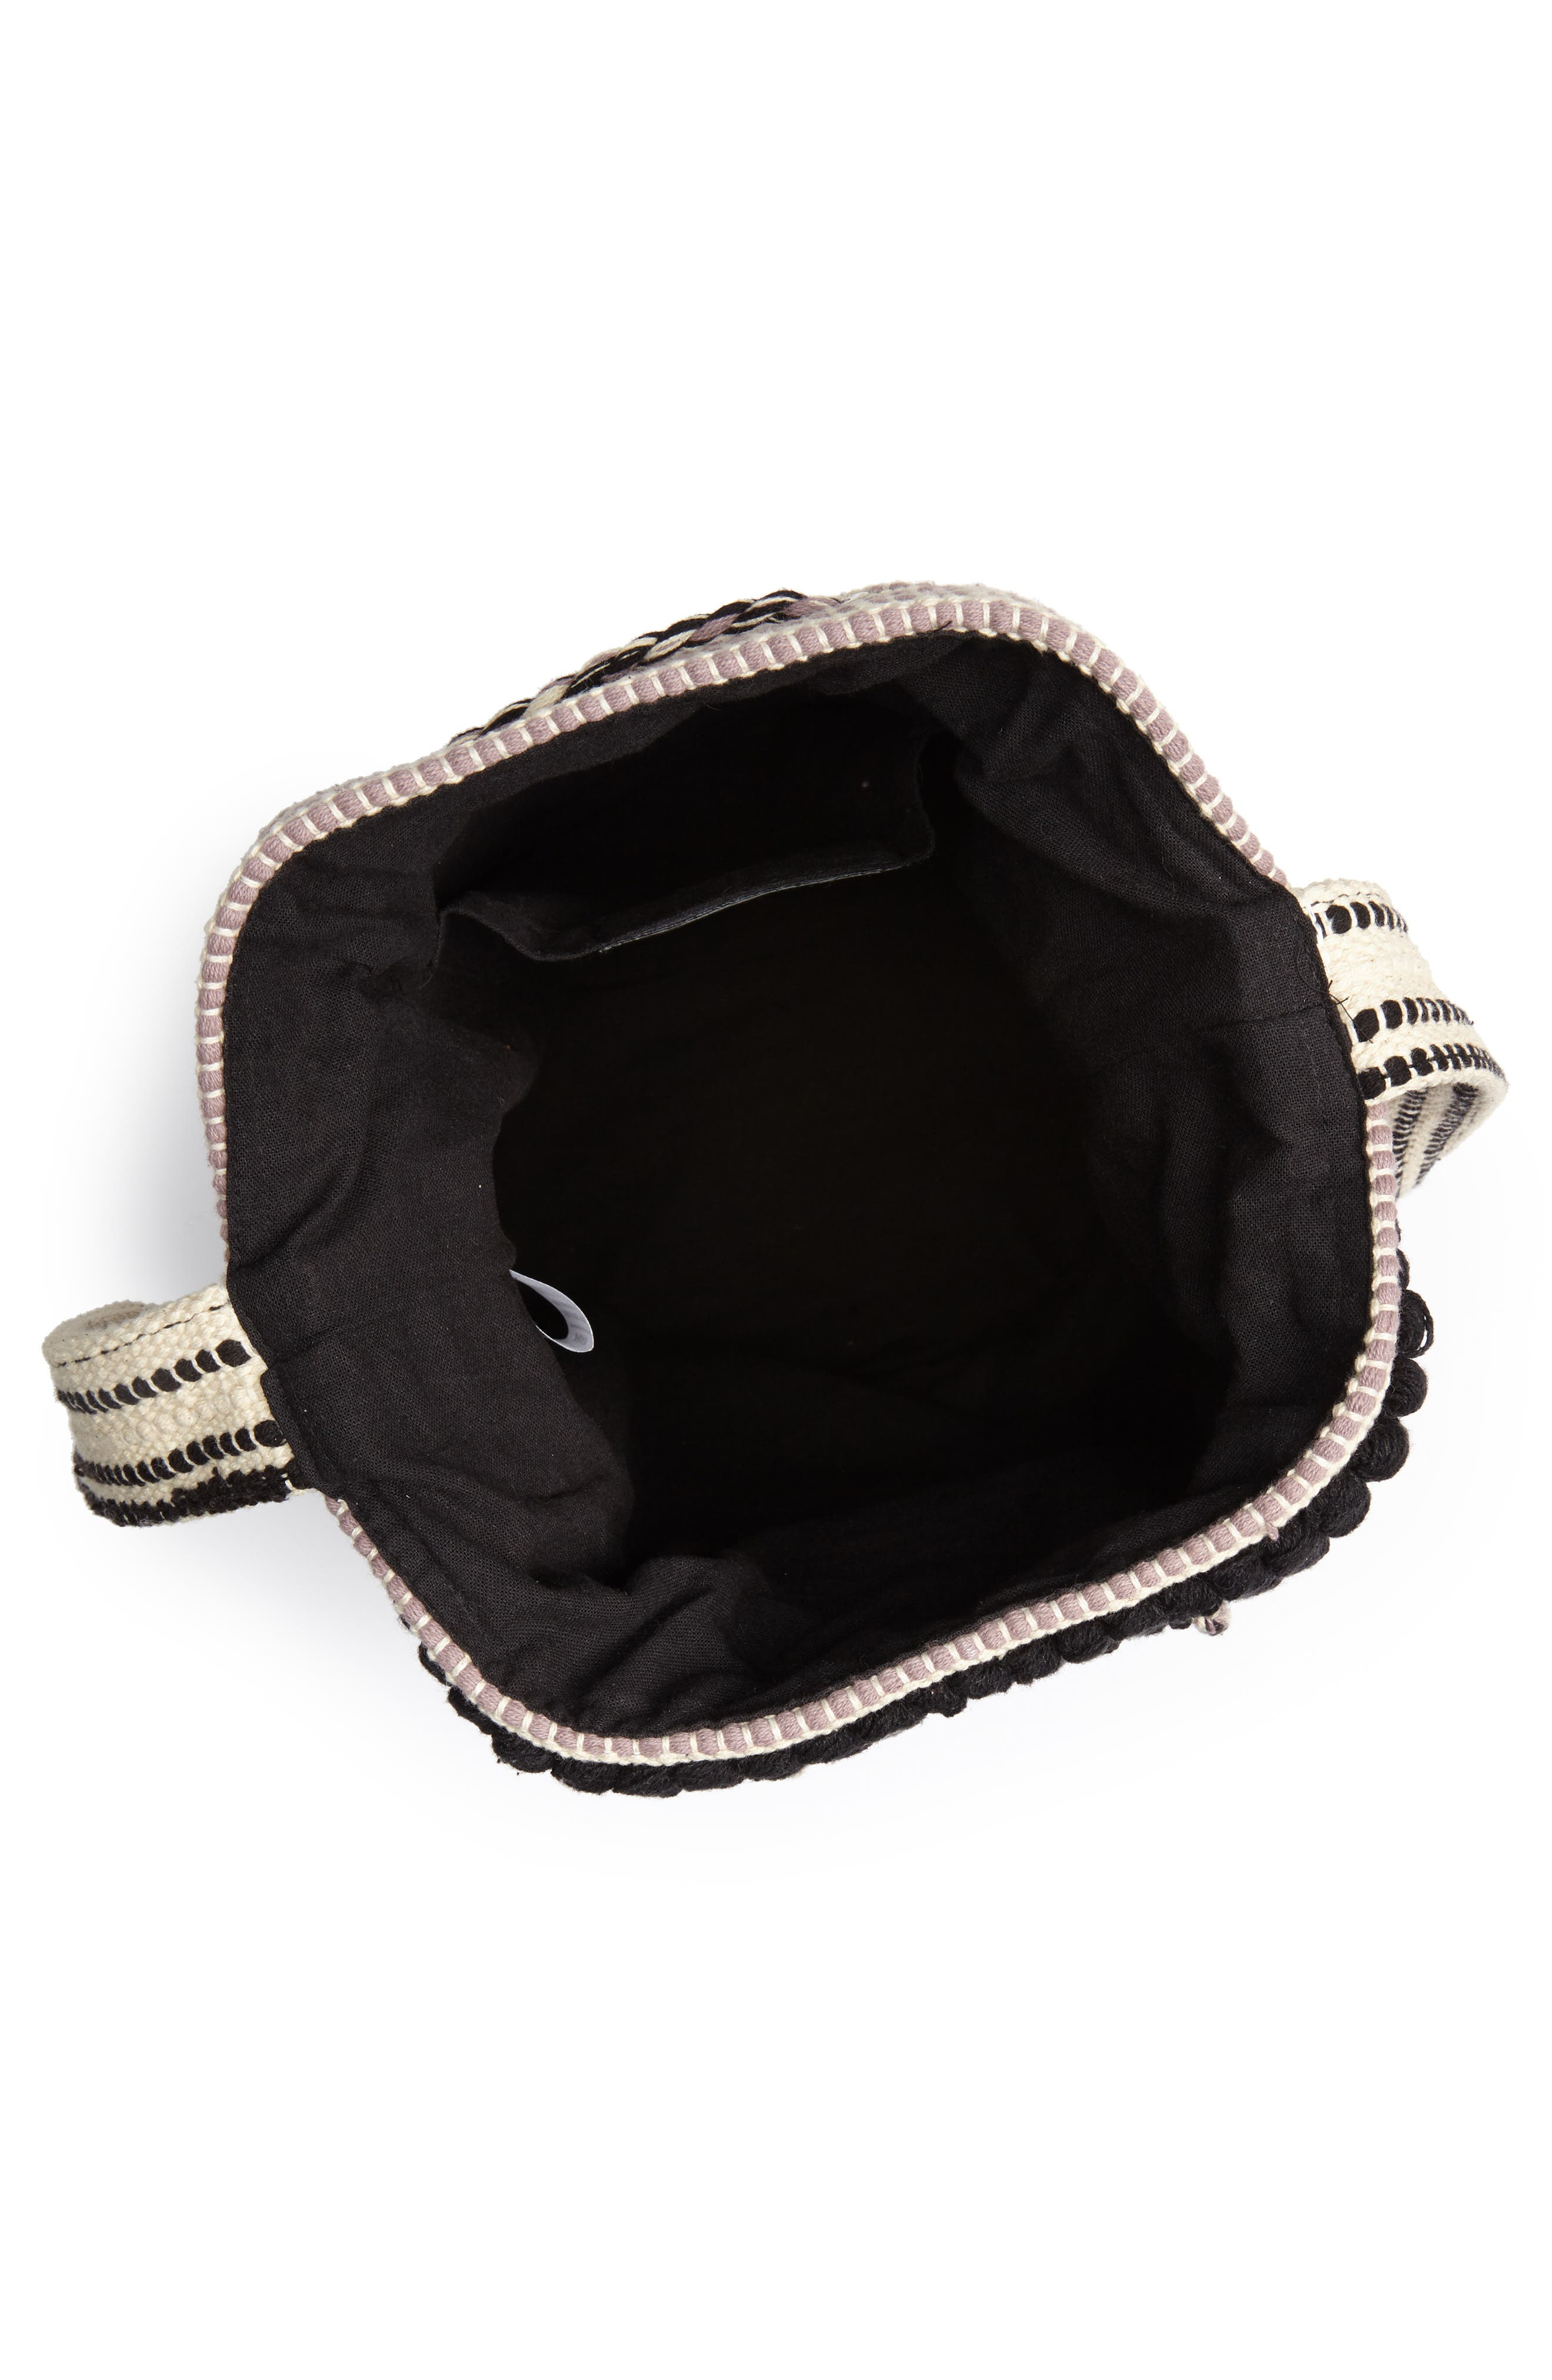 SOLE SOCIETY, Halay Woven Bucket Bag, Alternate thumbnail 5, color, 001